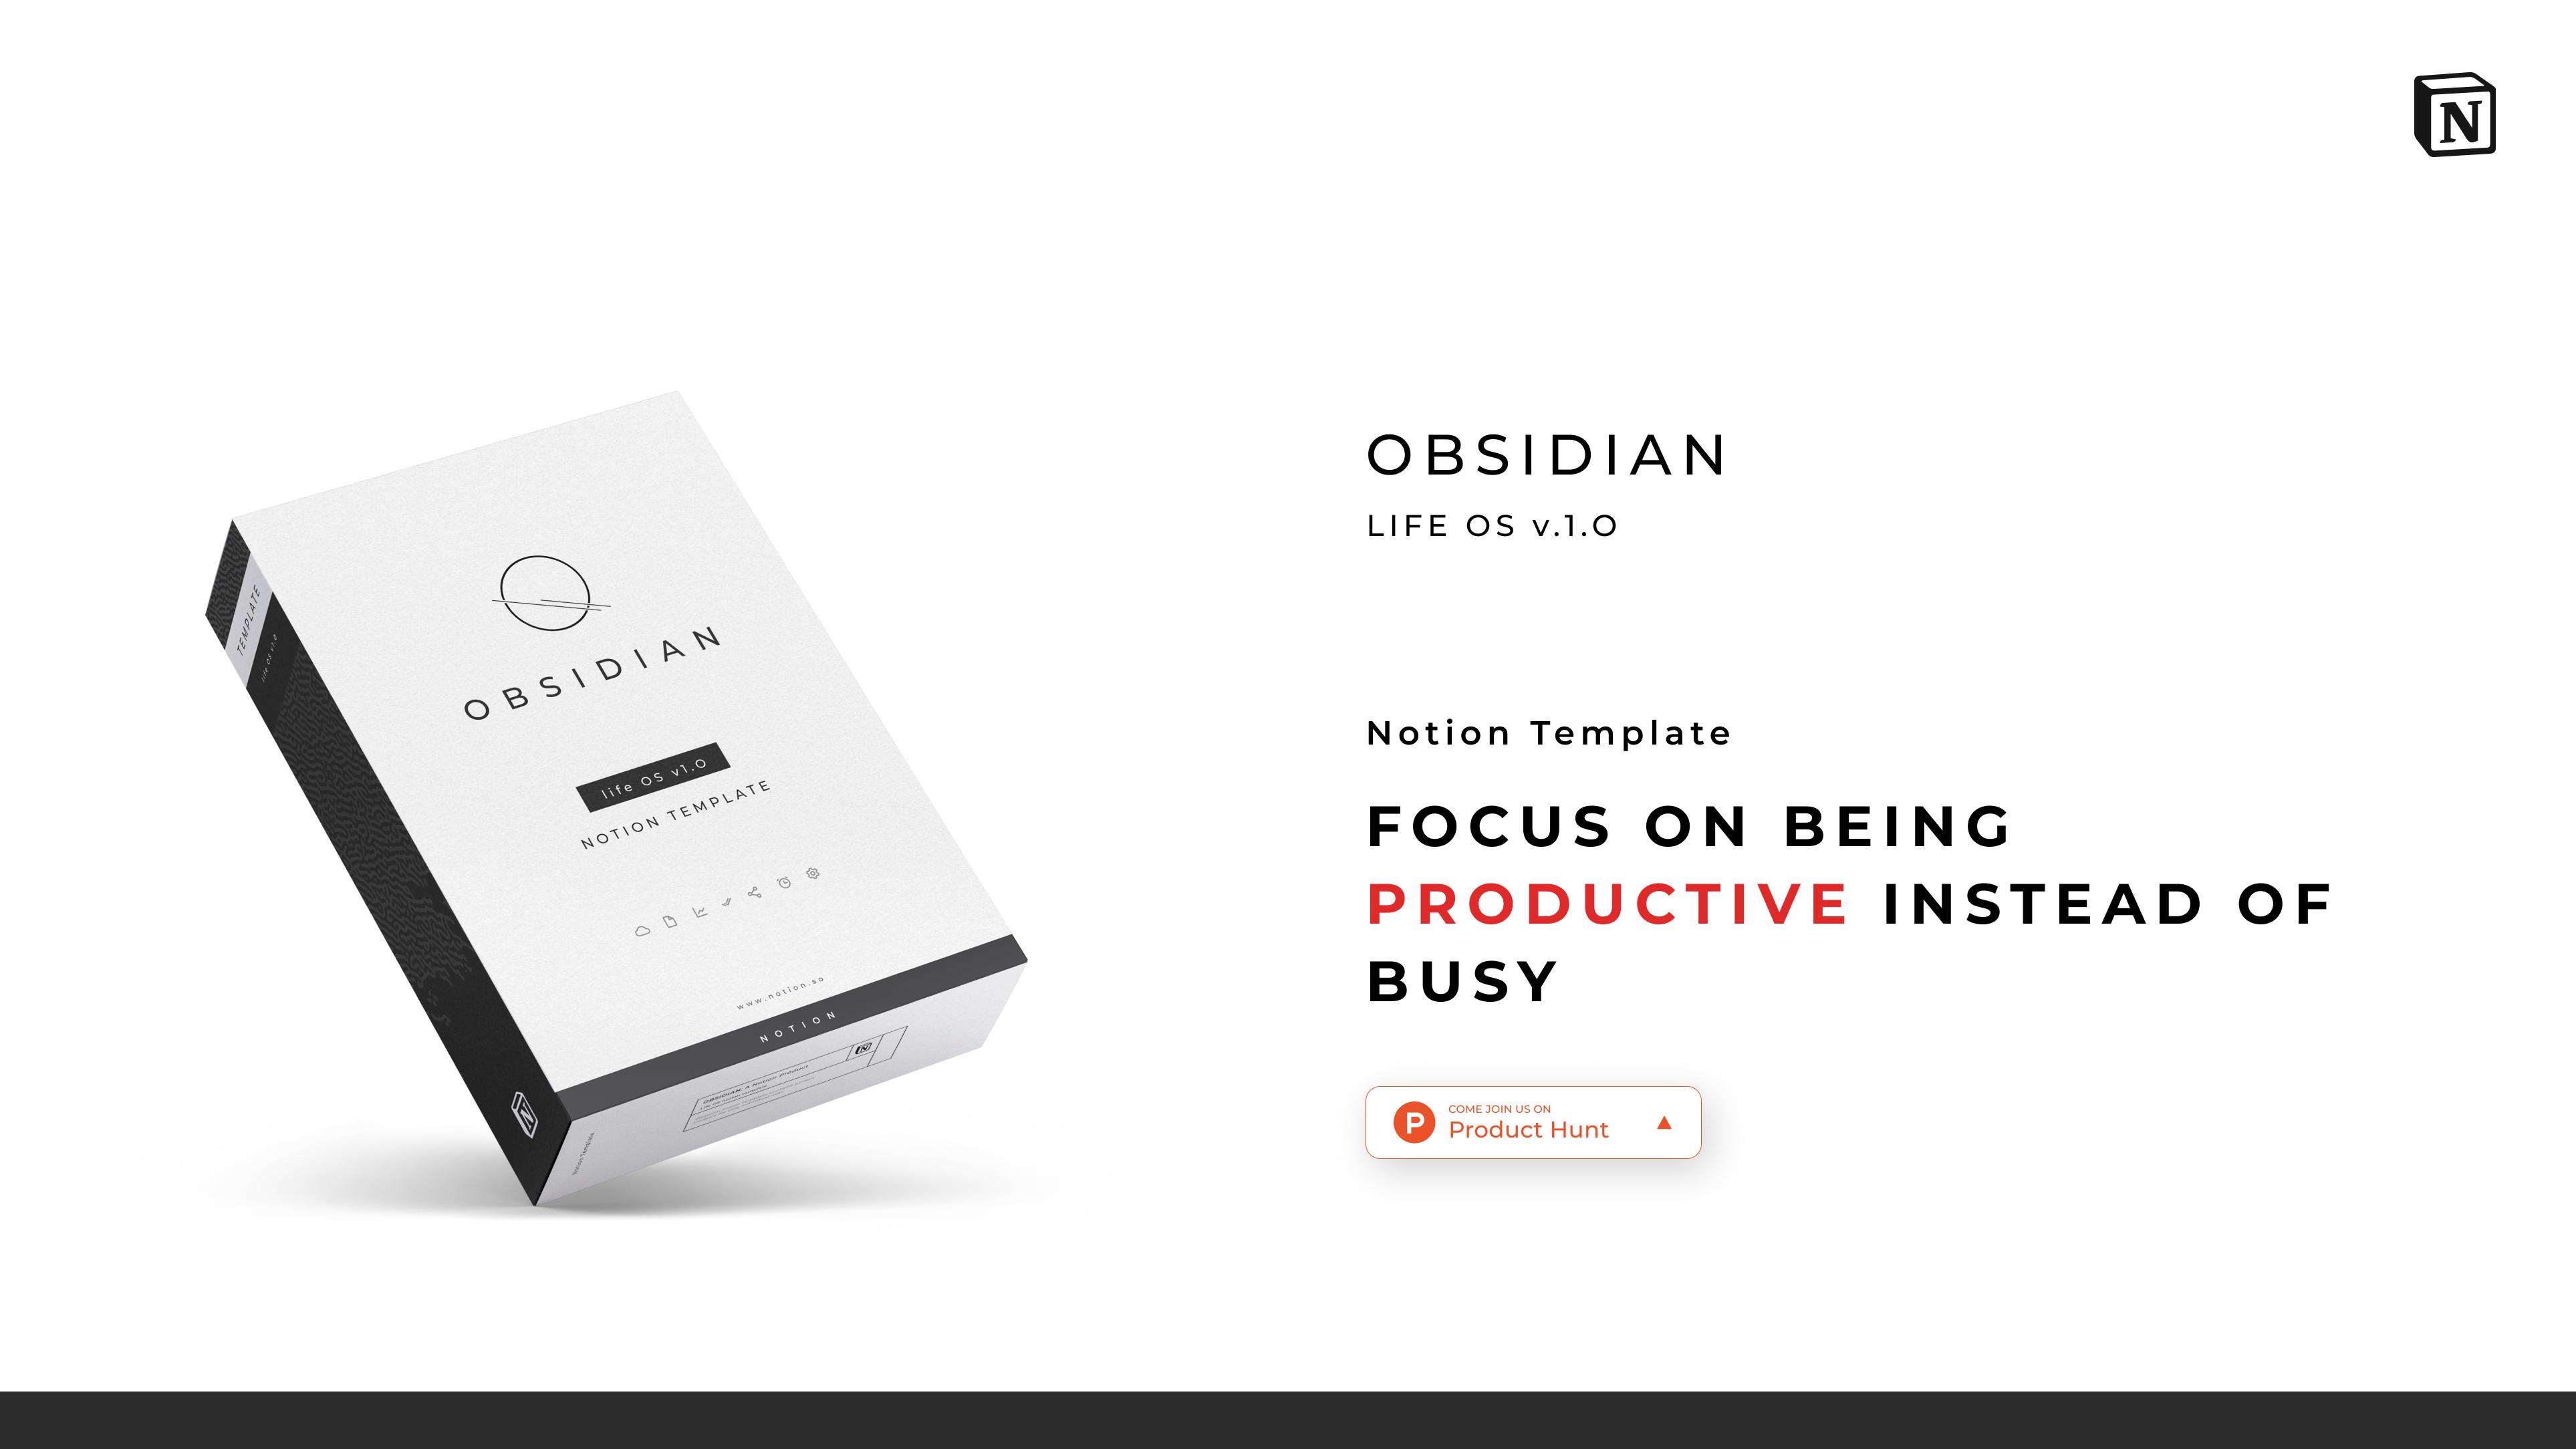 Obsidian Life OS